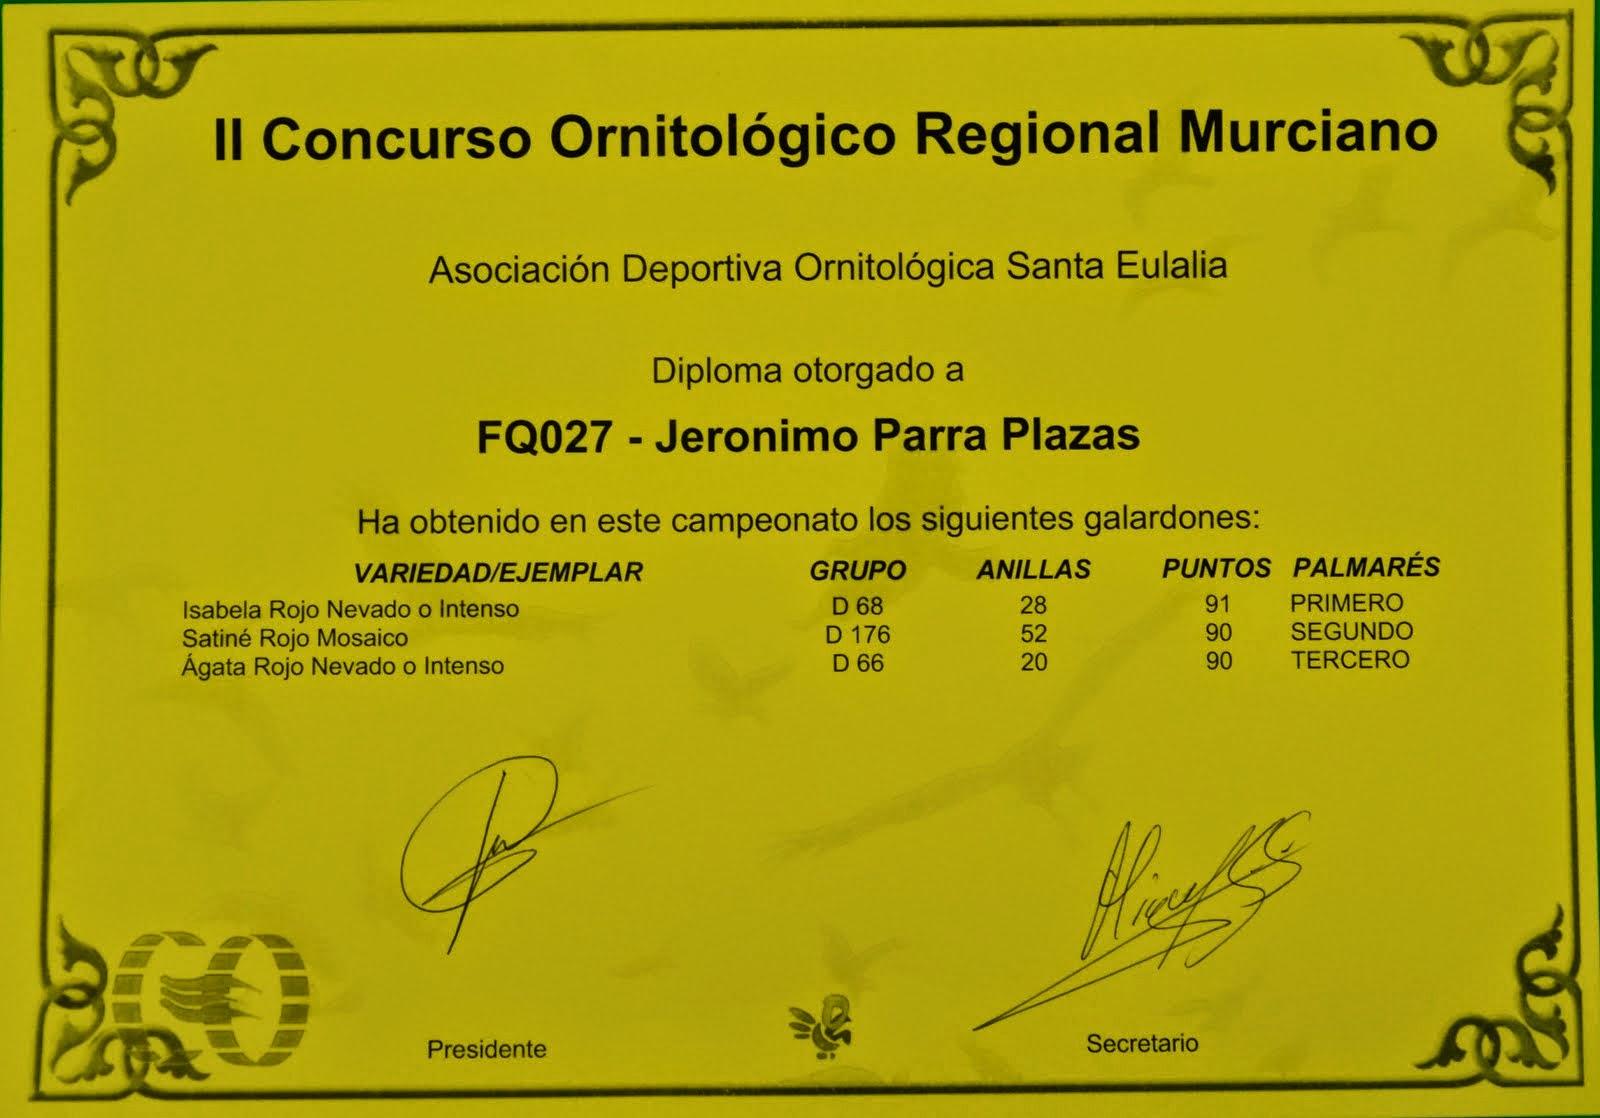 TROFEO DEL REGIONAL MURCIANO 2014